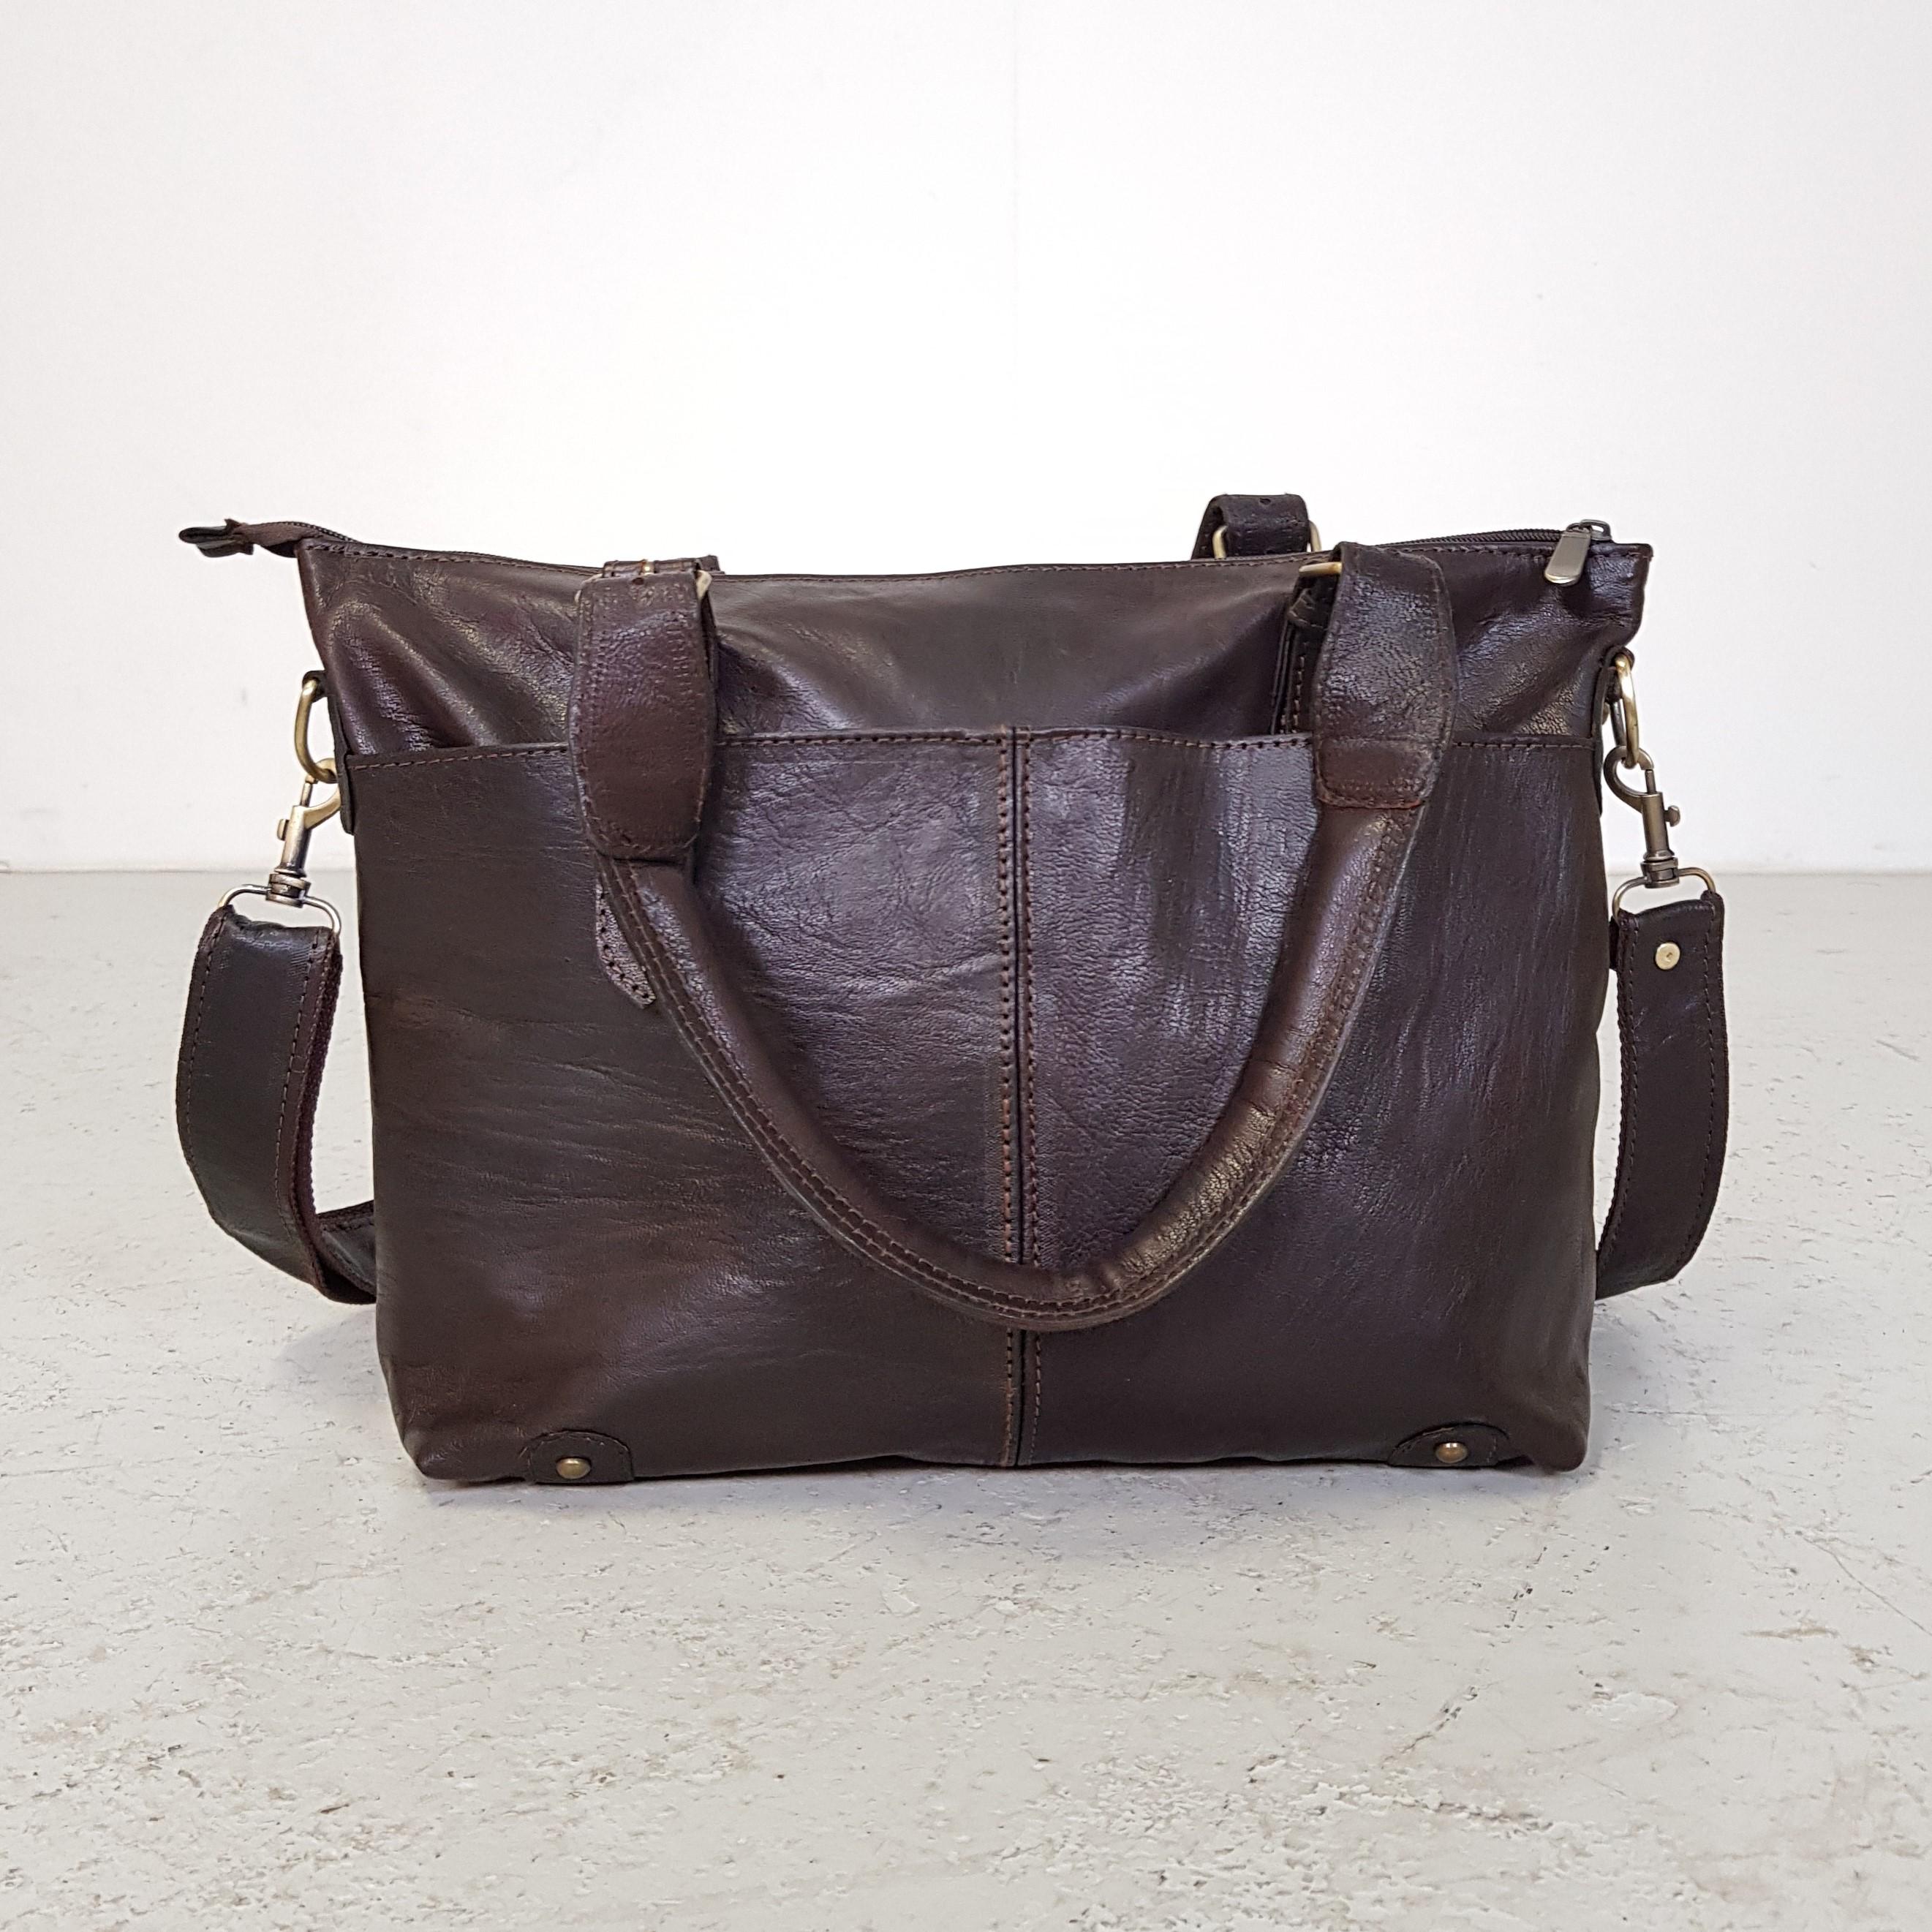 3f6d828ac8e Forside / Tasker / Tasker / Taske fra Marokko i mørkebrun Læder